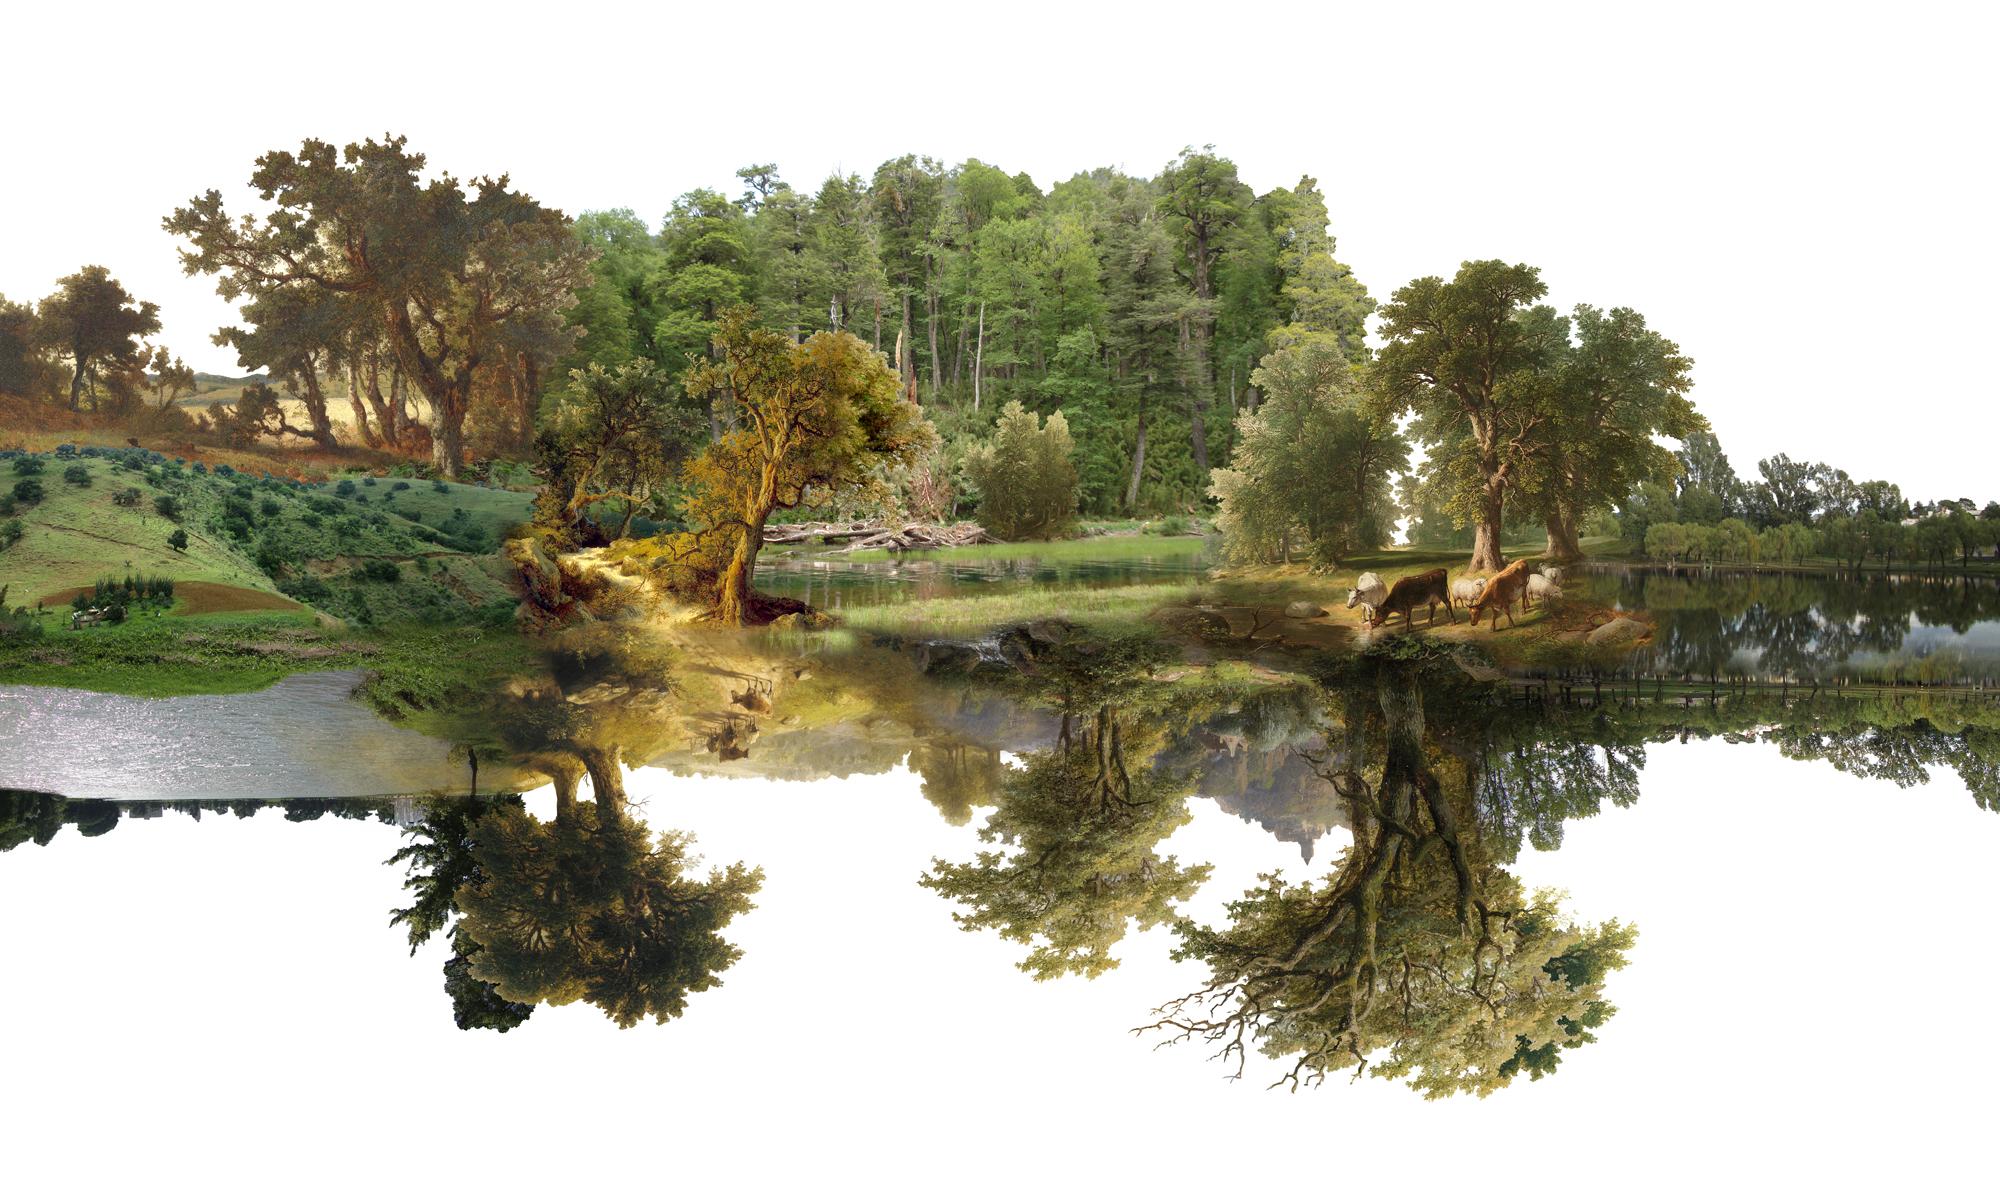 Achenbach_Andreas_-_Landscape_with_a_Stream_1-baja